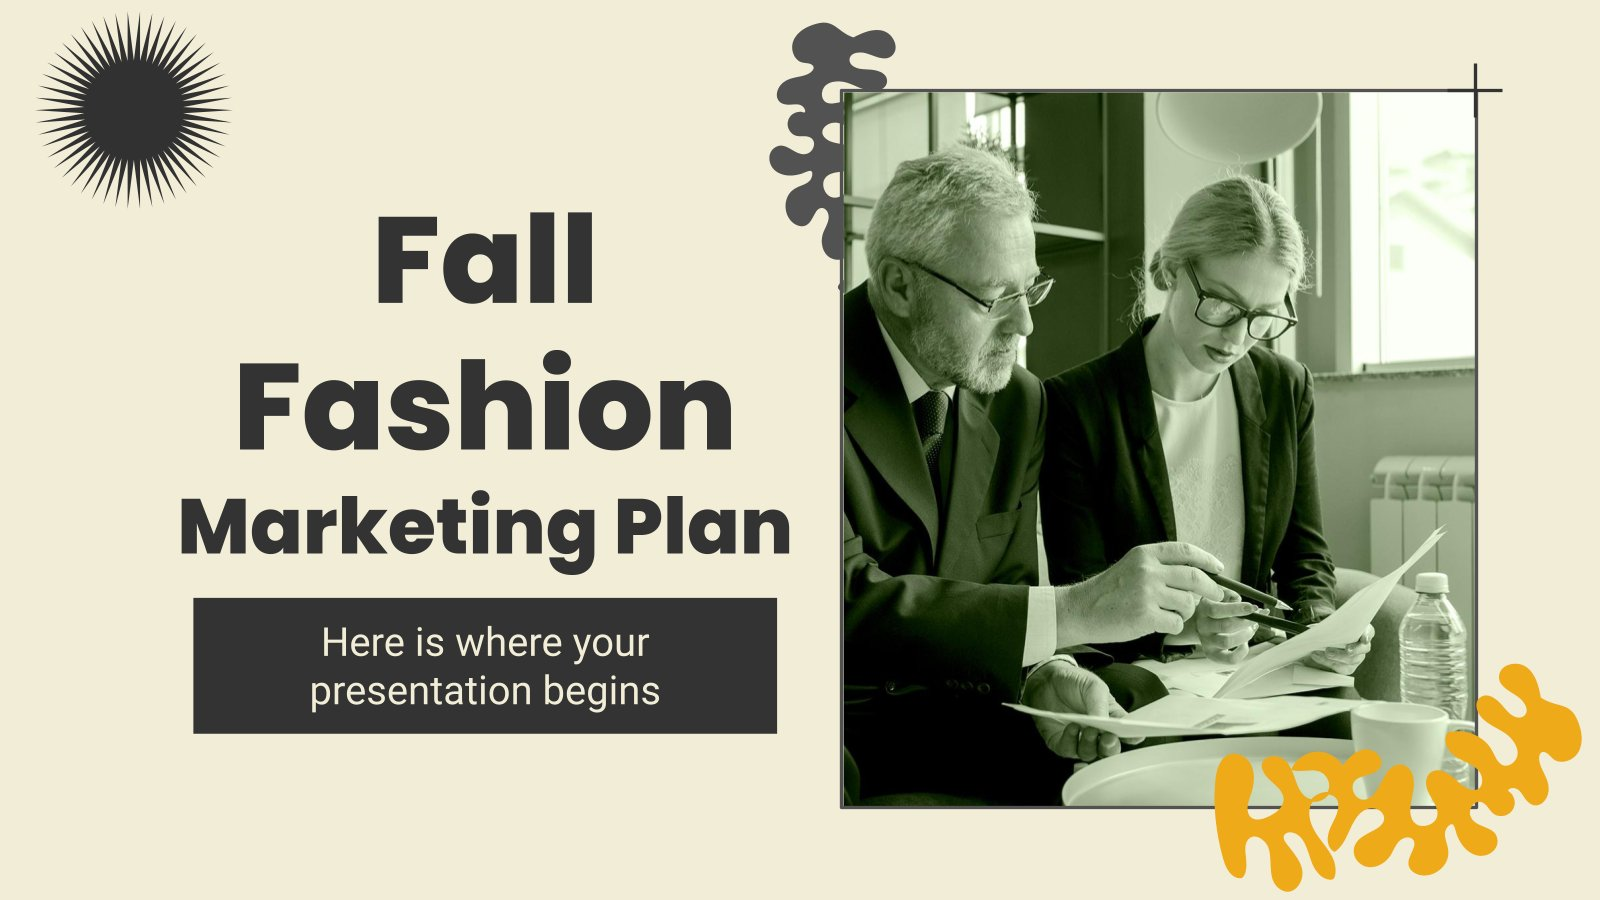 Plantilla de presentación Plan de marketing para moda de otoño